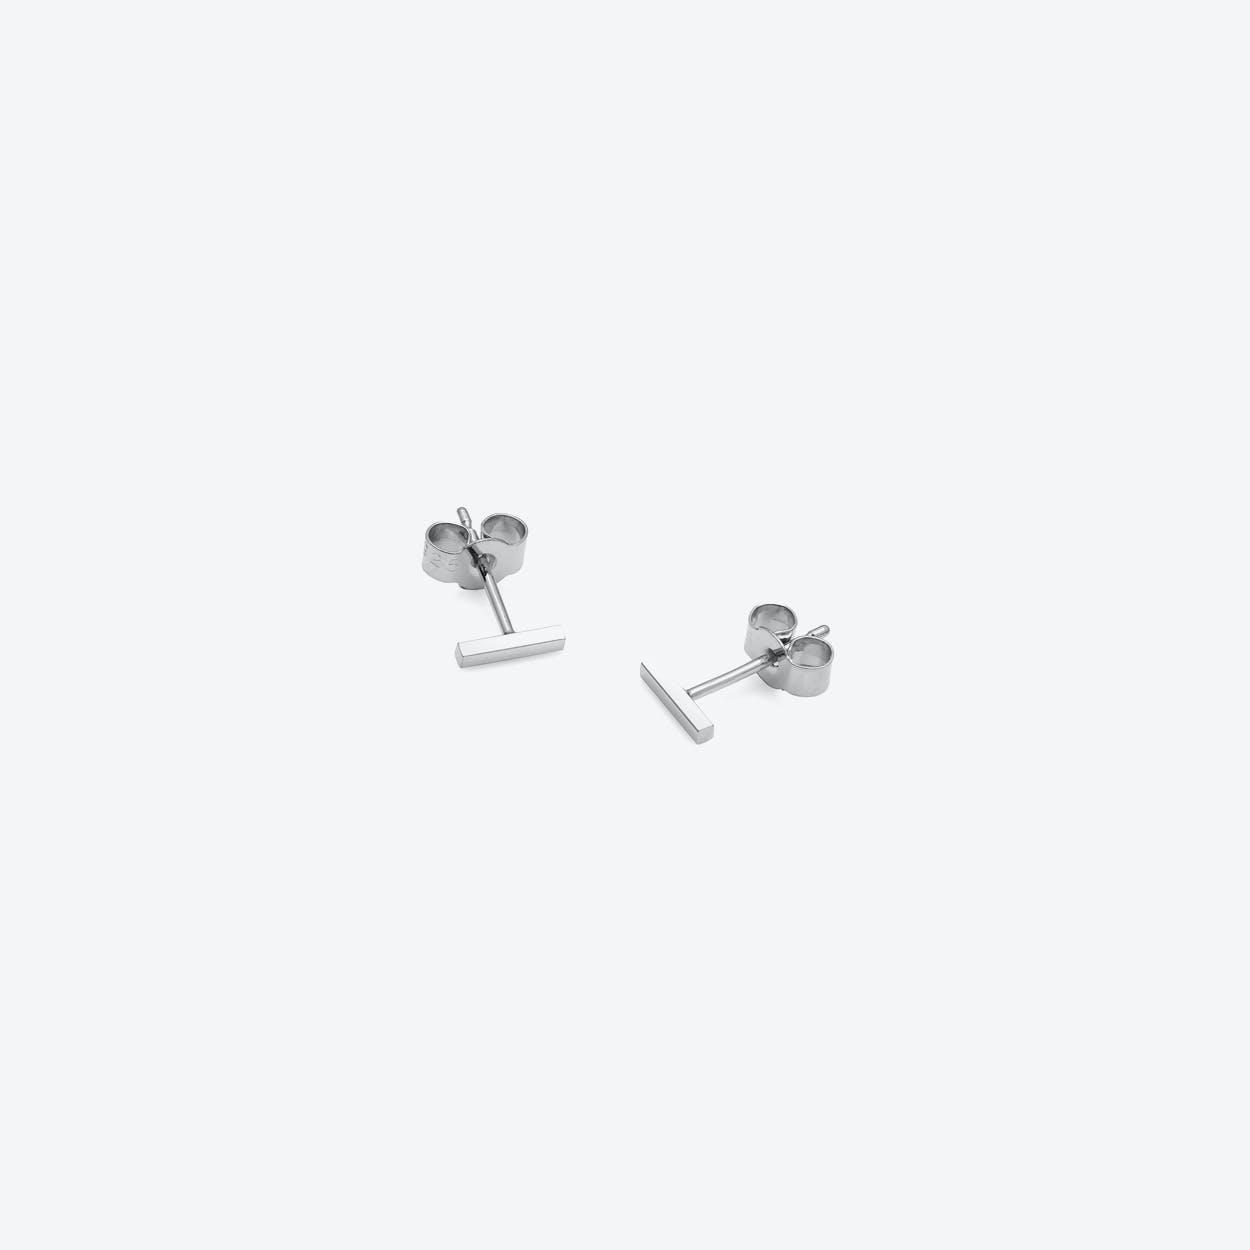 Mini Square Bar Stud Earrings in Silver